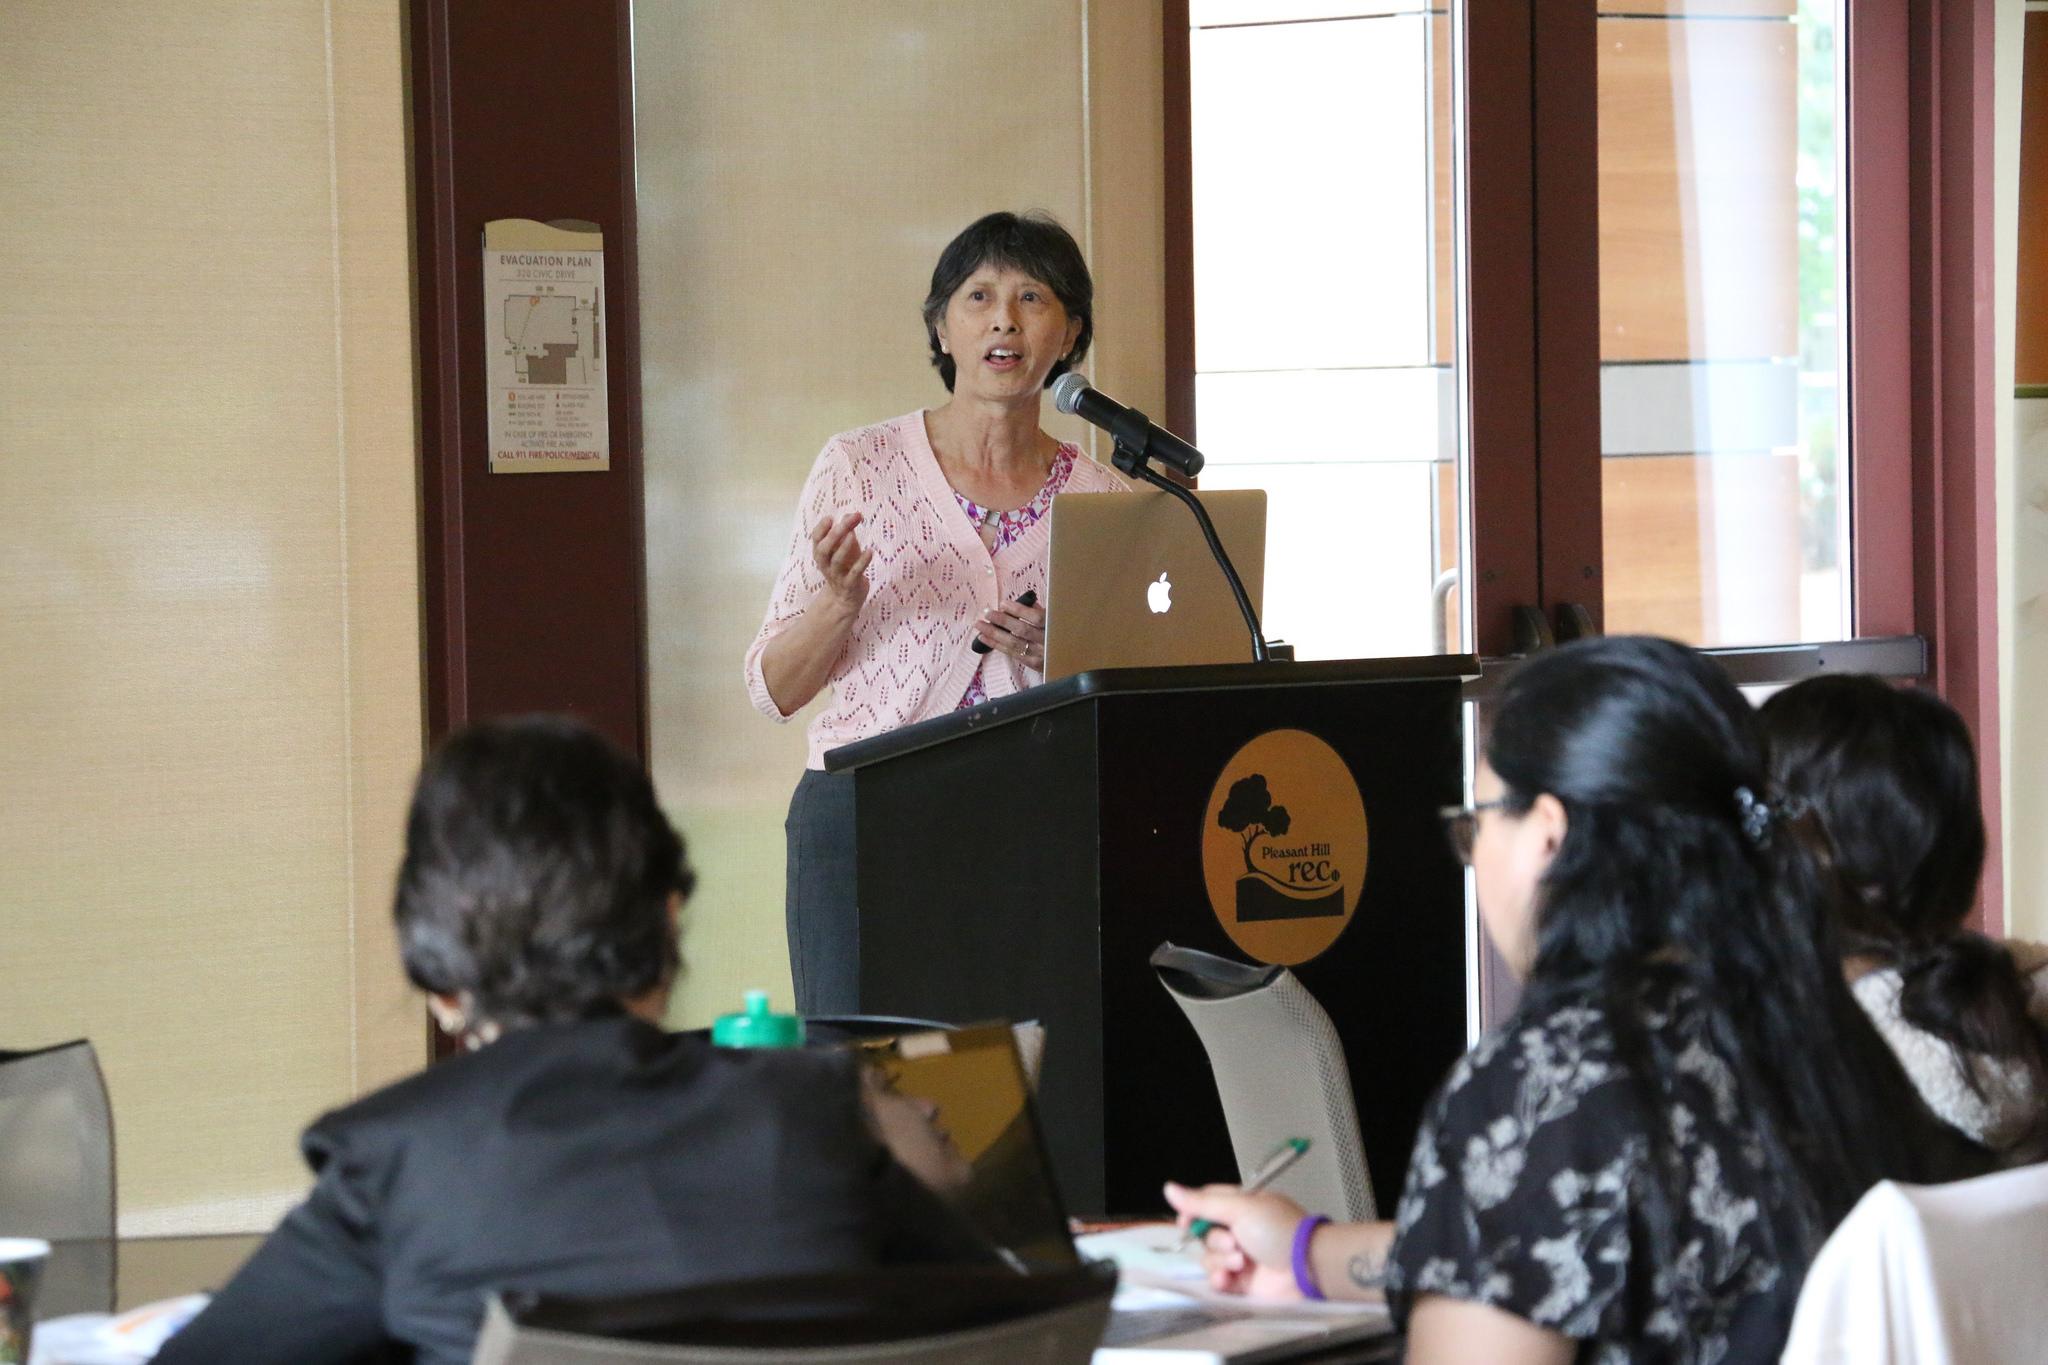 Sue Garces RN captivates the audience